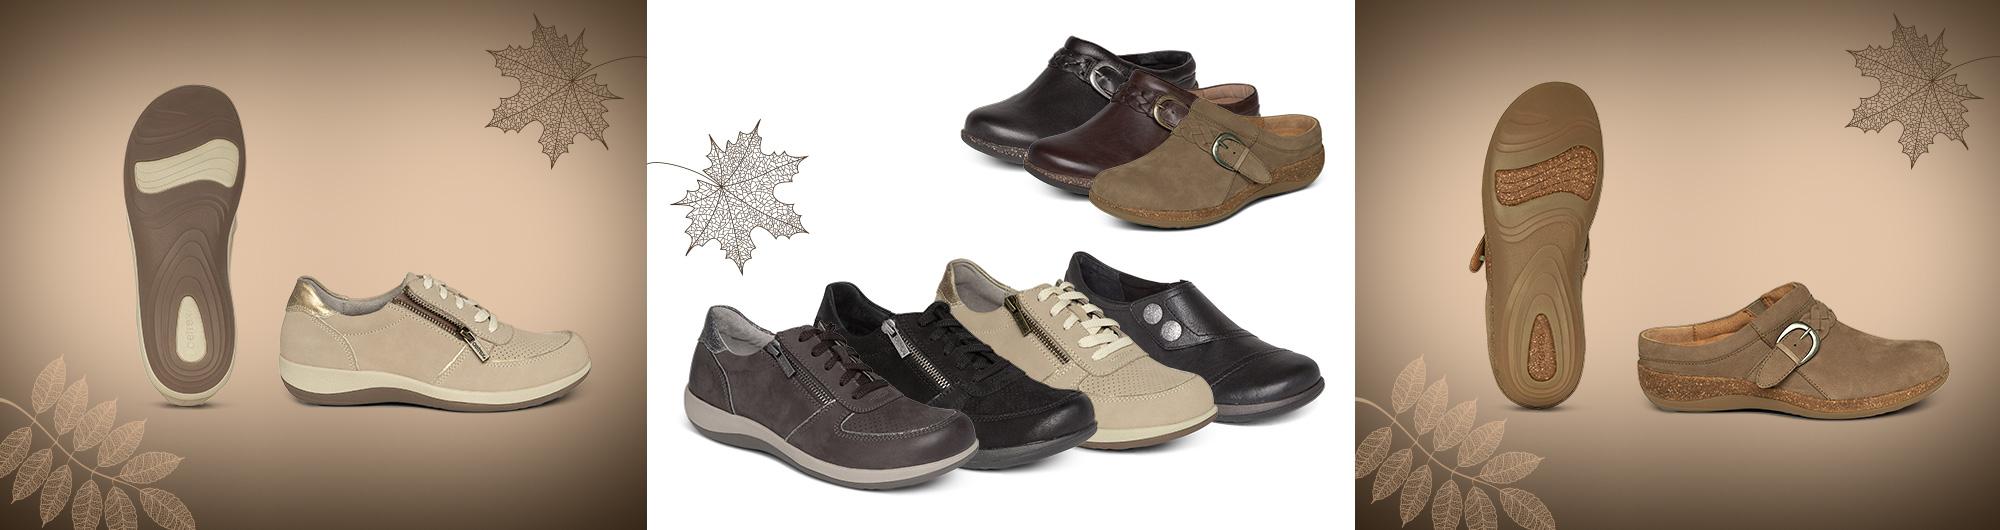 Дамски обувки Aetrex есен 2020